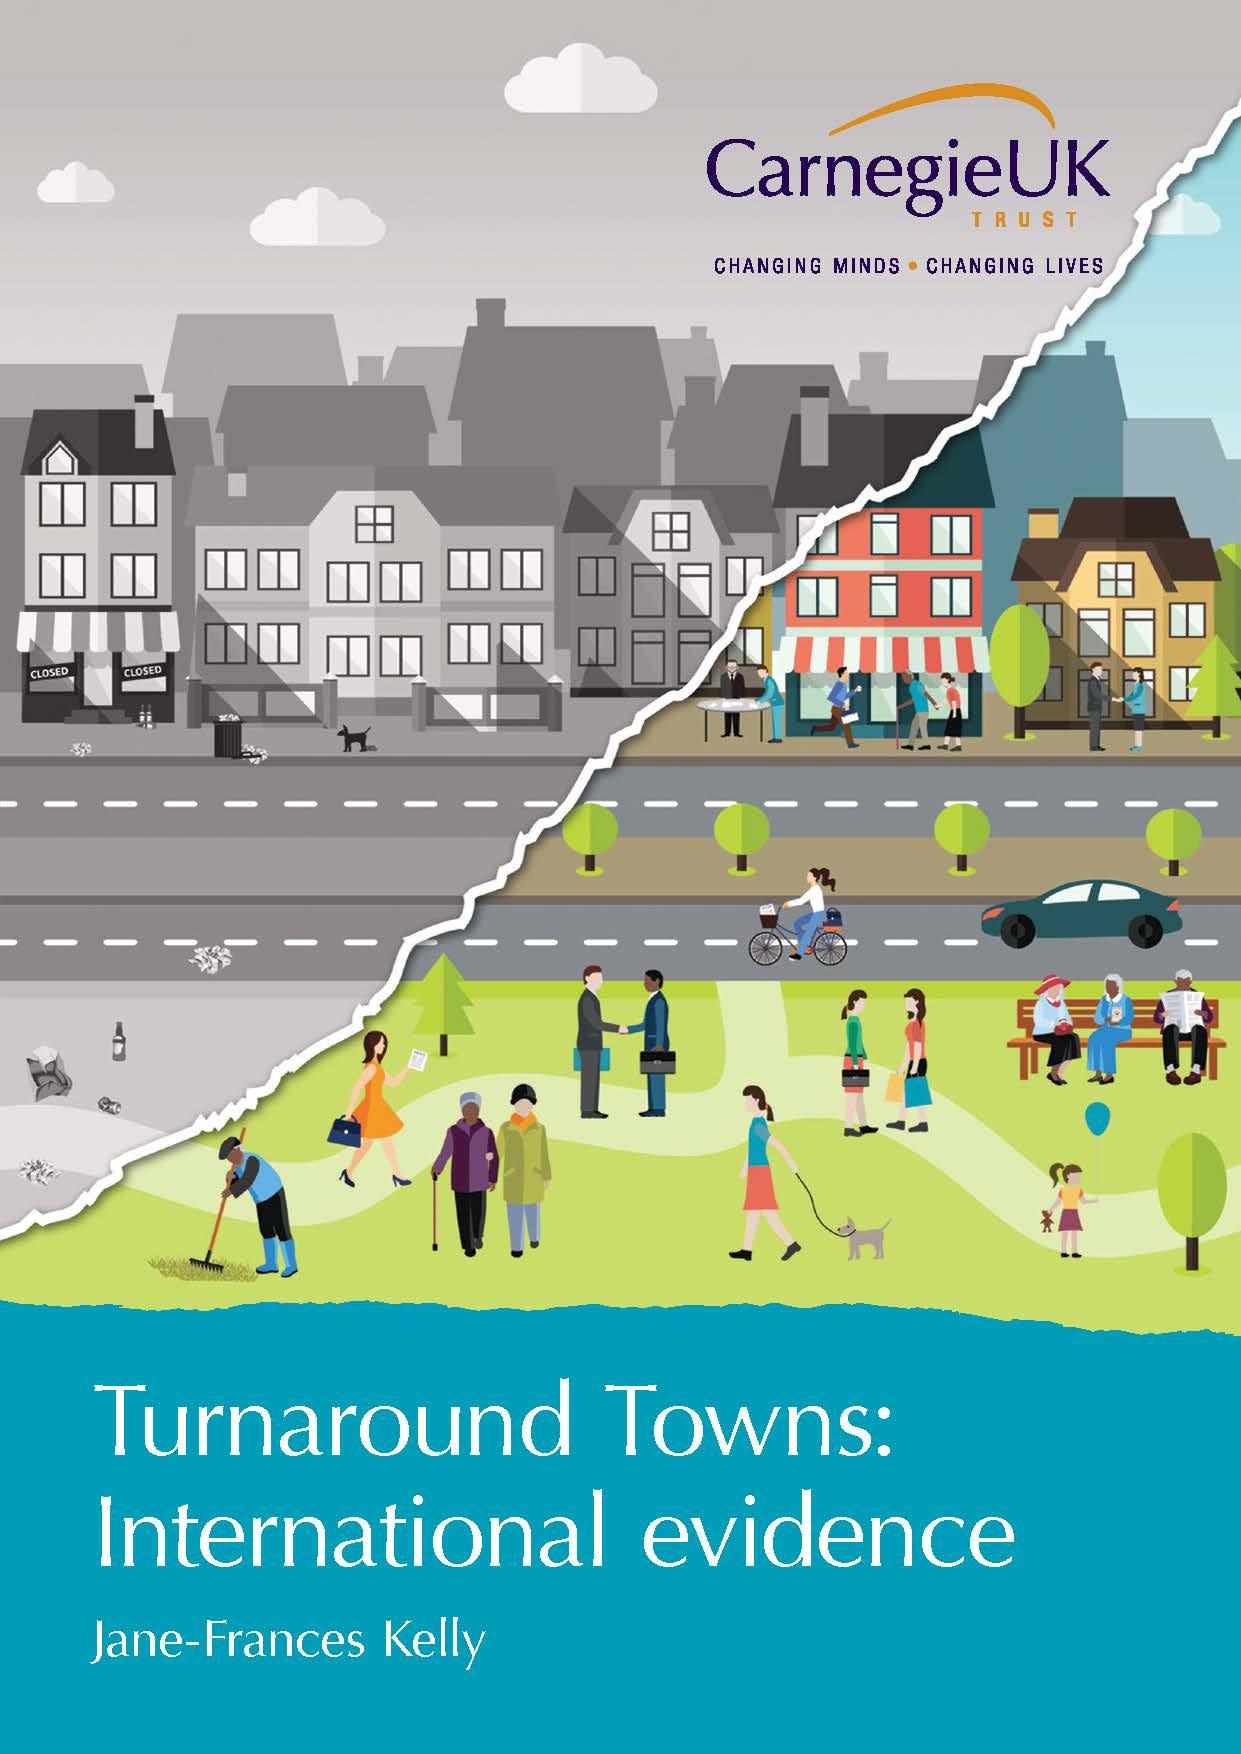 Turnaround Towns: International evidence